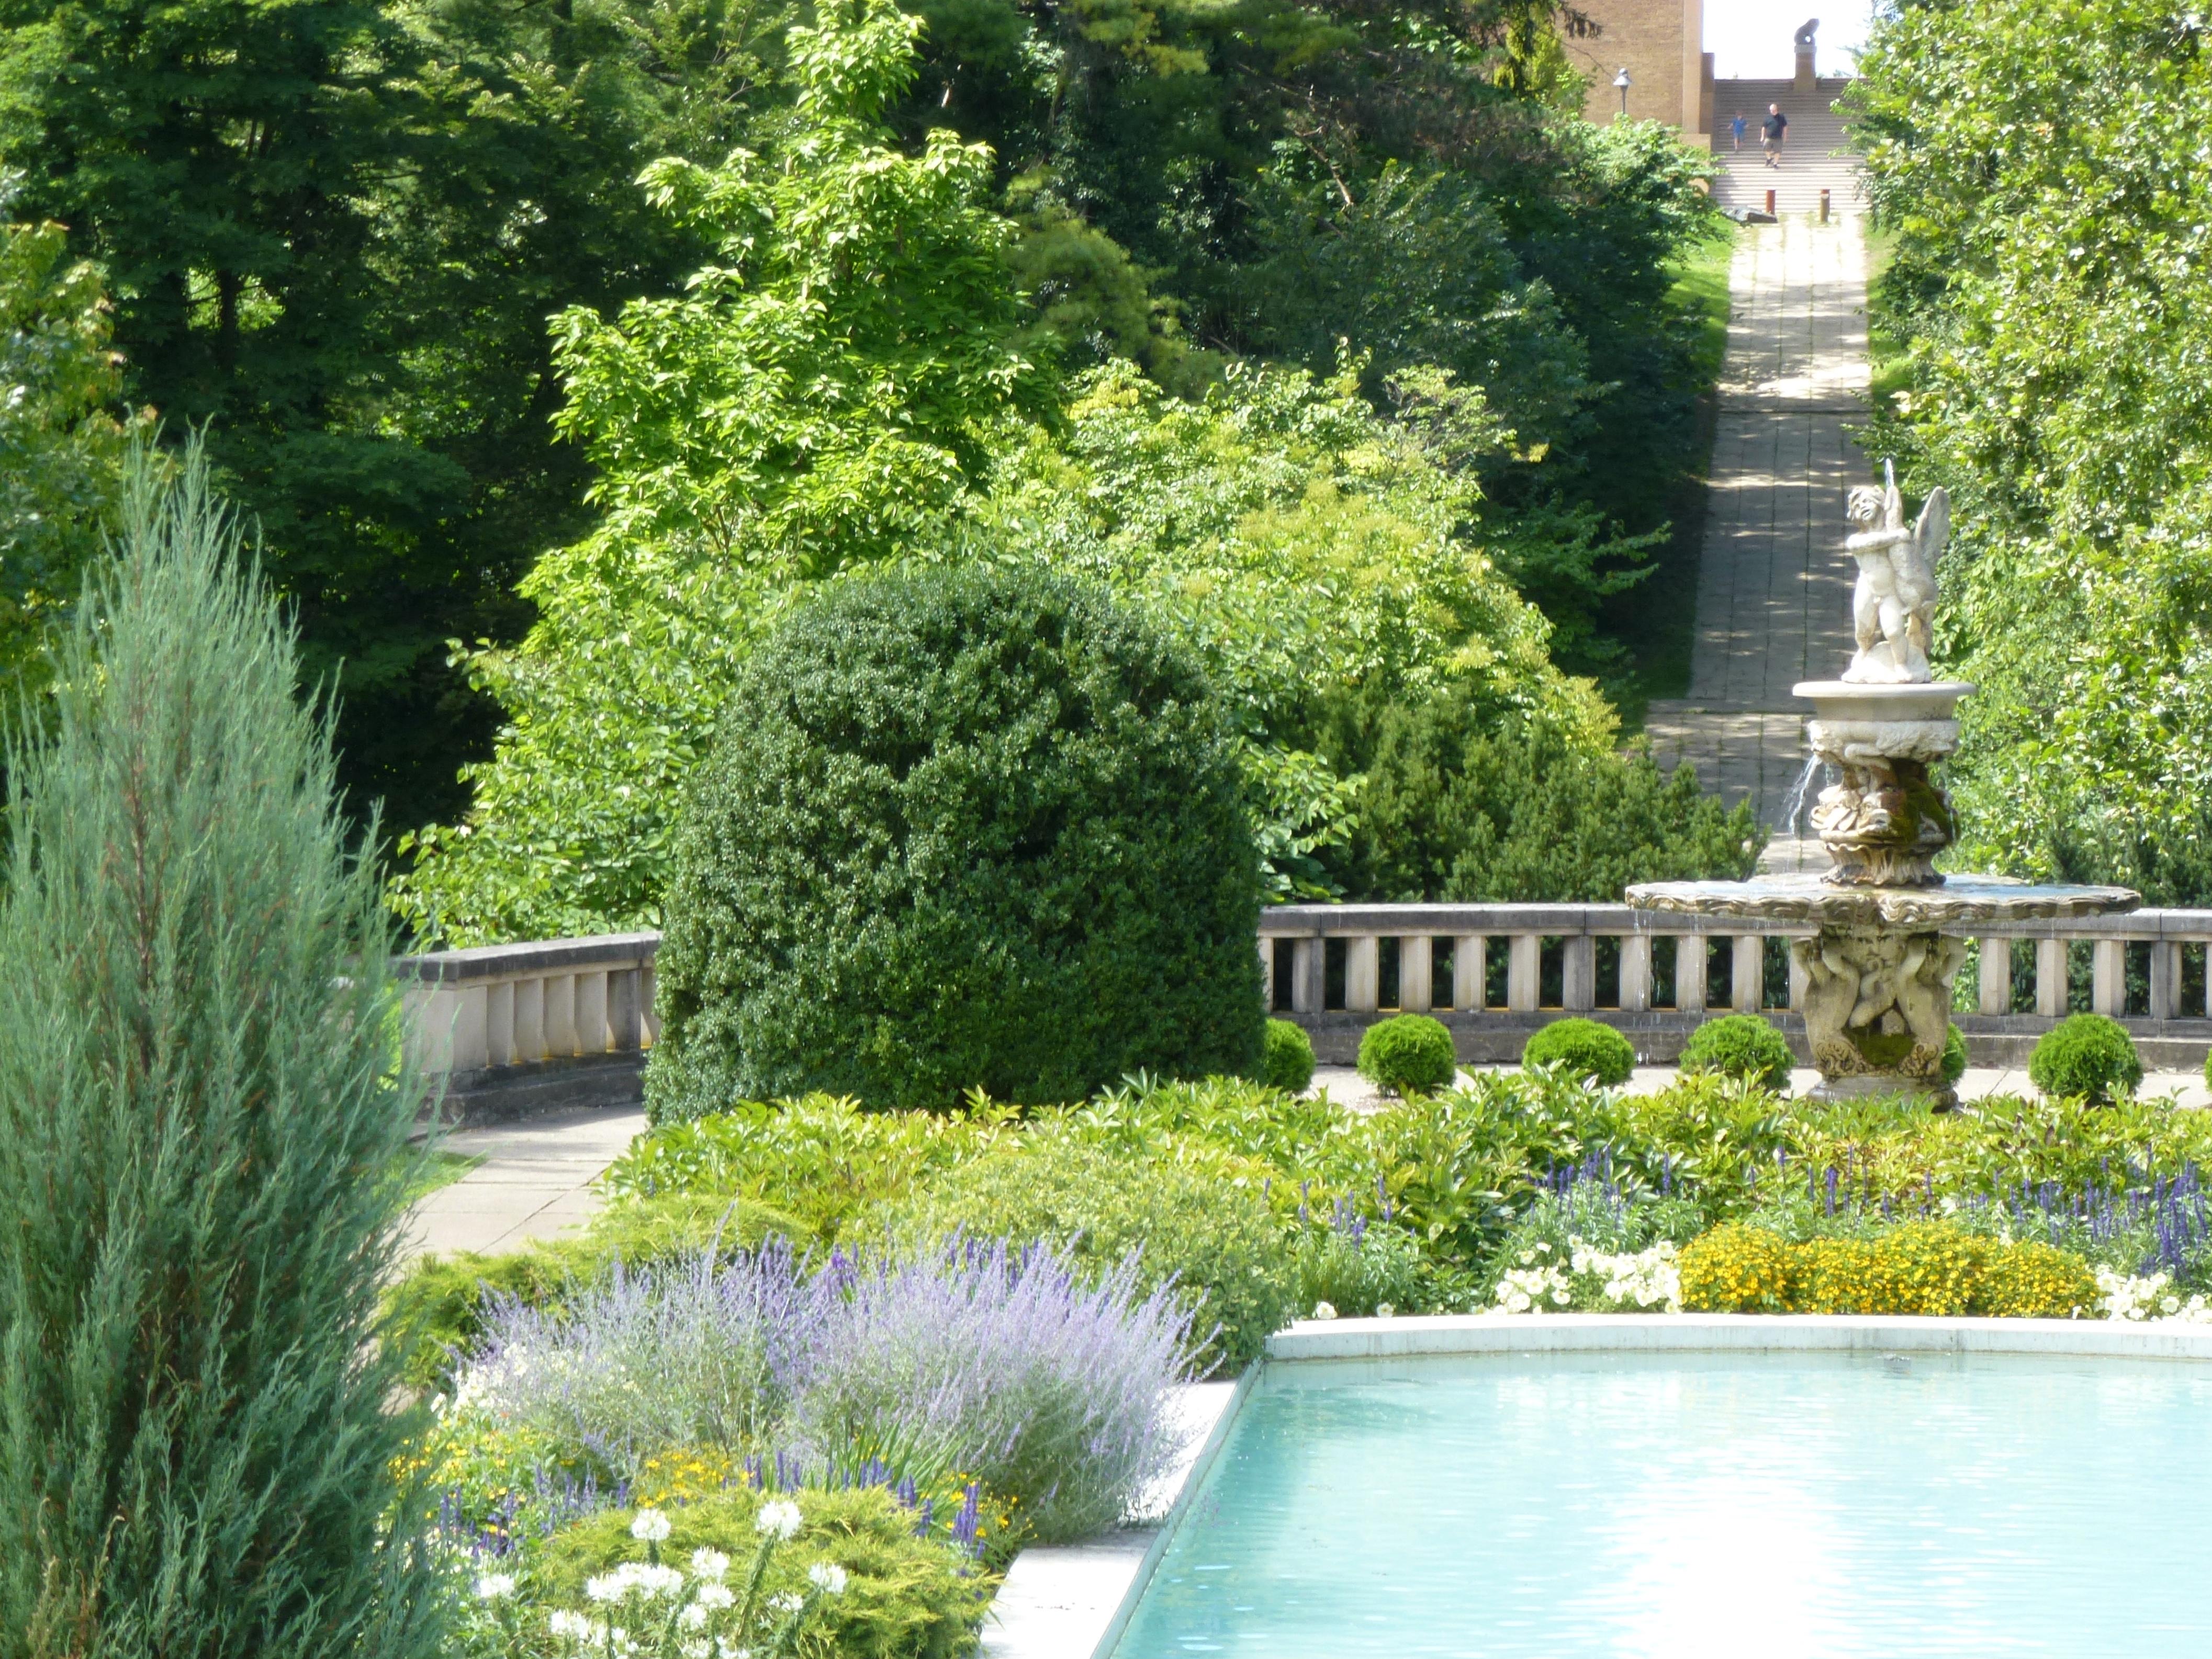 A visit to CRANBROOK GARDENS | LATEBLOOMERBUDS